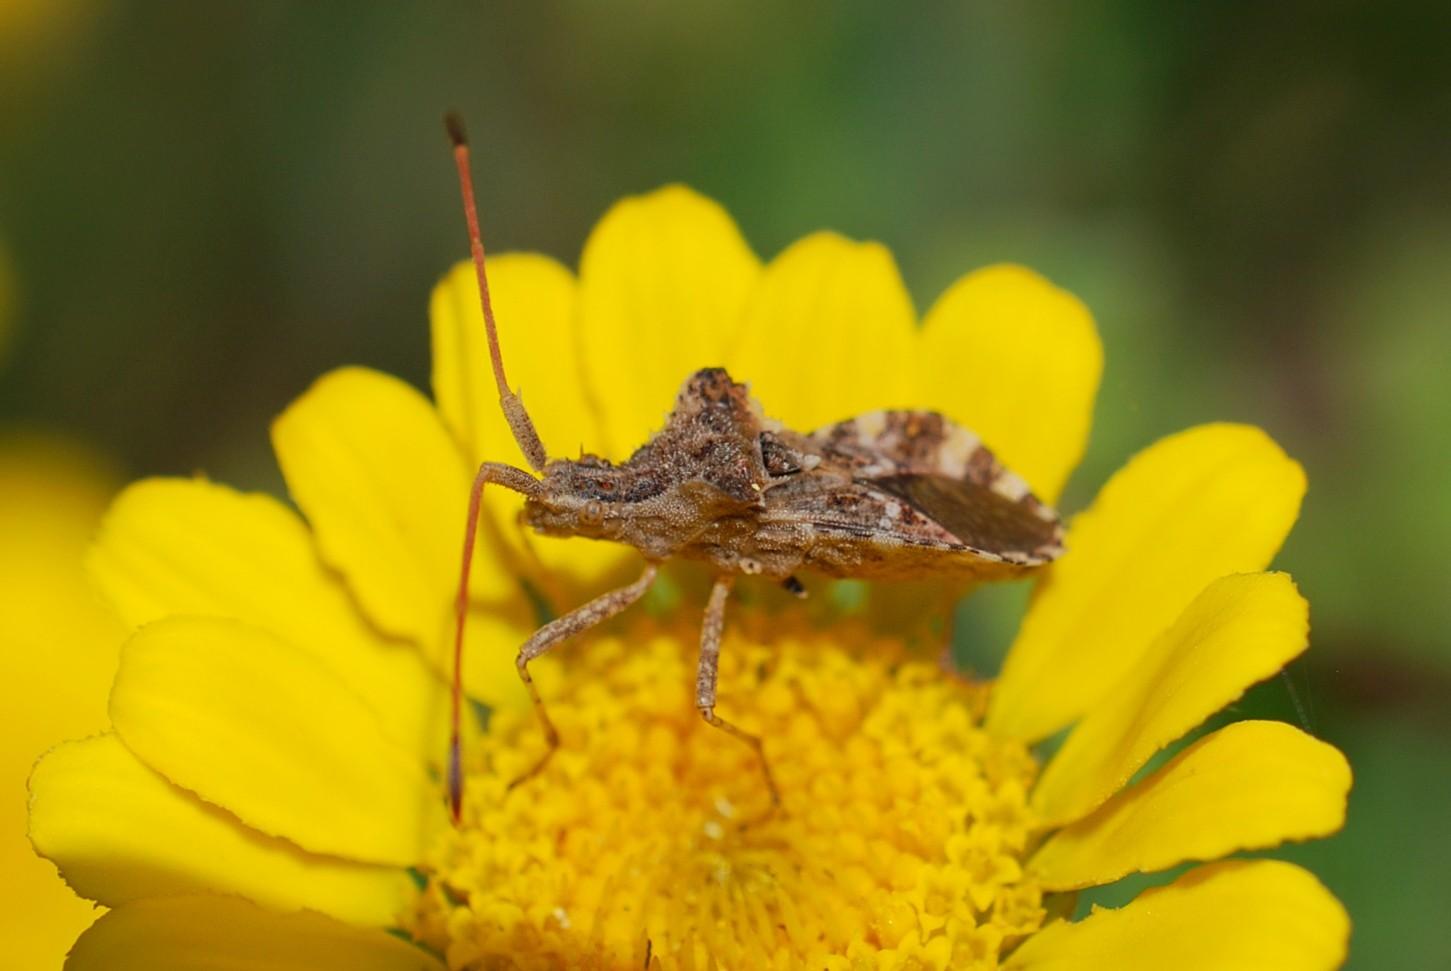 Centrocoris sp. - Coreidae